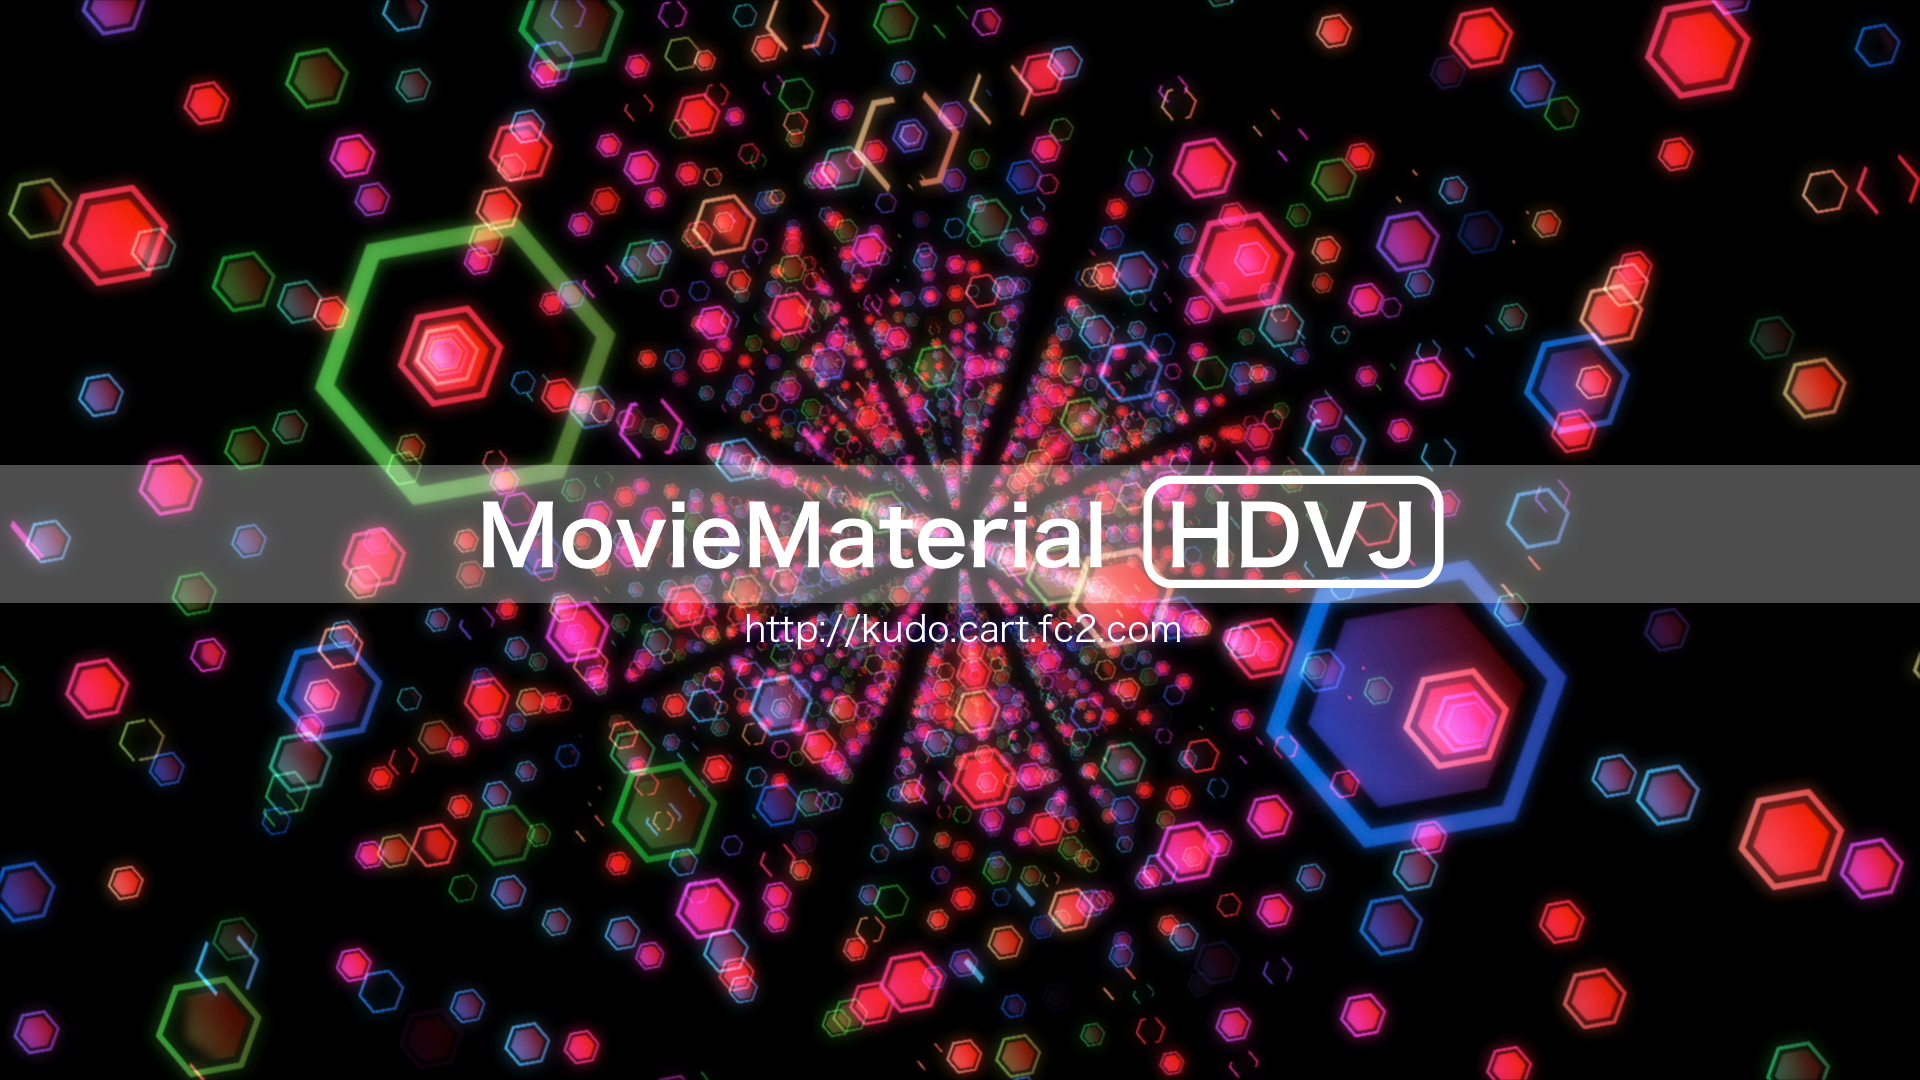 MovieMaterial HDVJ フルハイビジョンVJ動画素材集 画像4